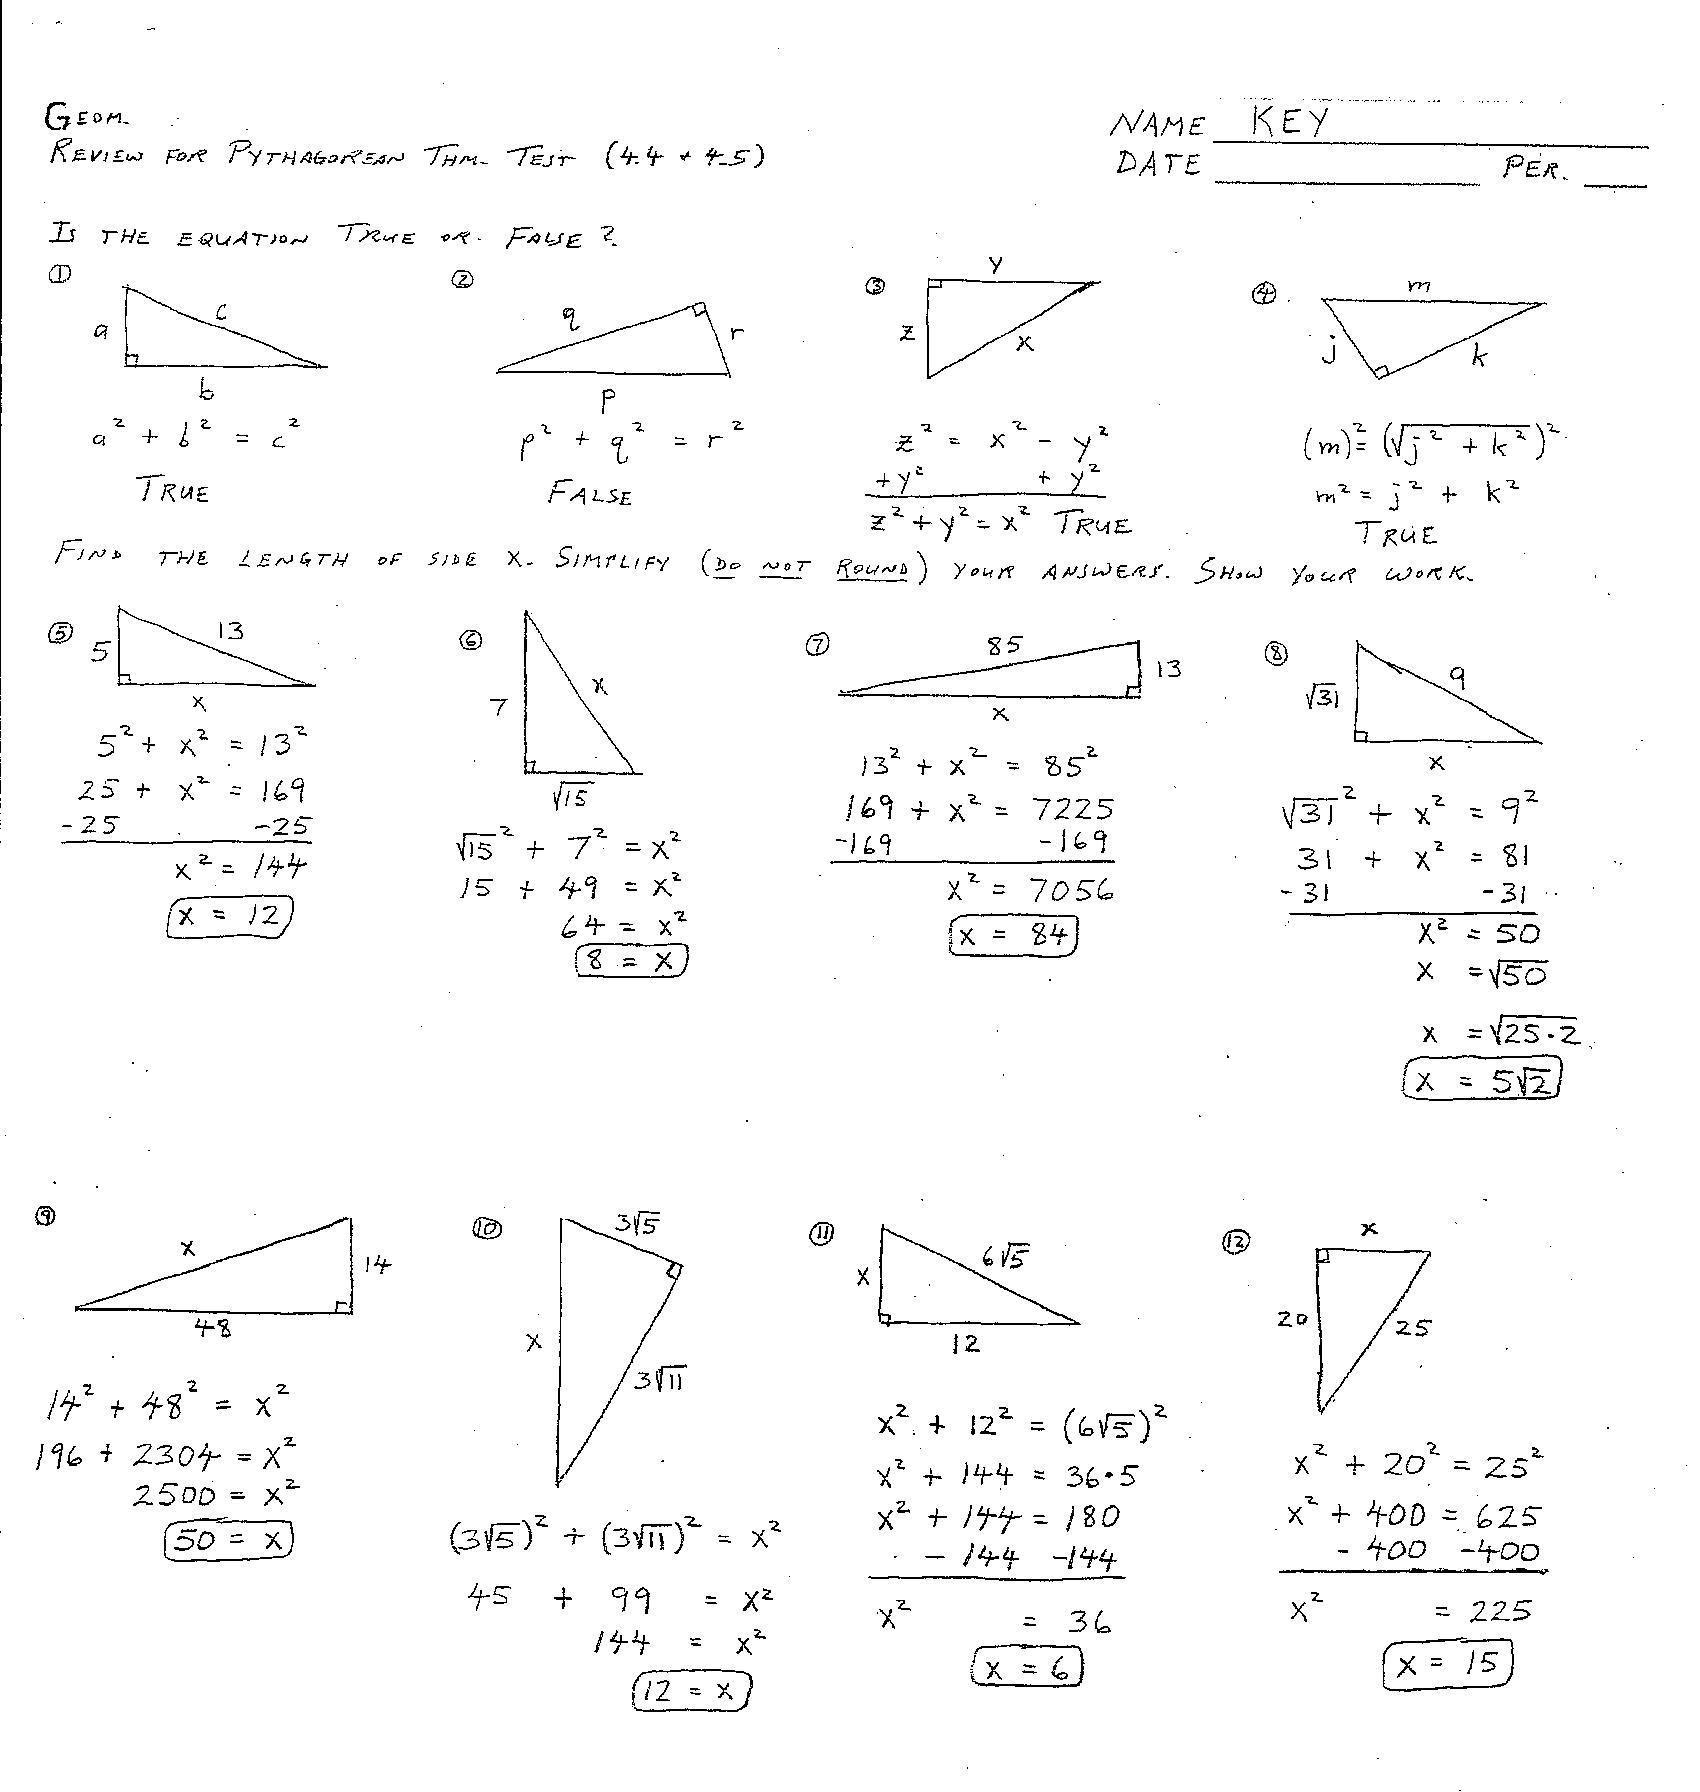 Worksheet Isosceles Triangle Theorem Worksheet Grass